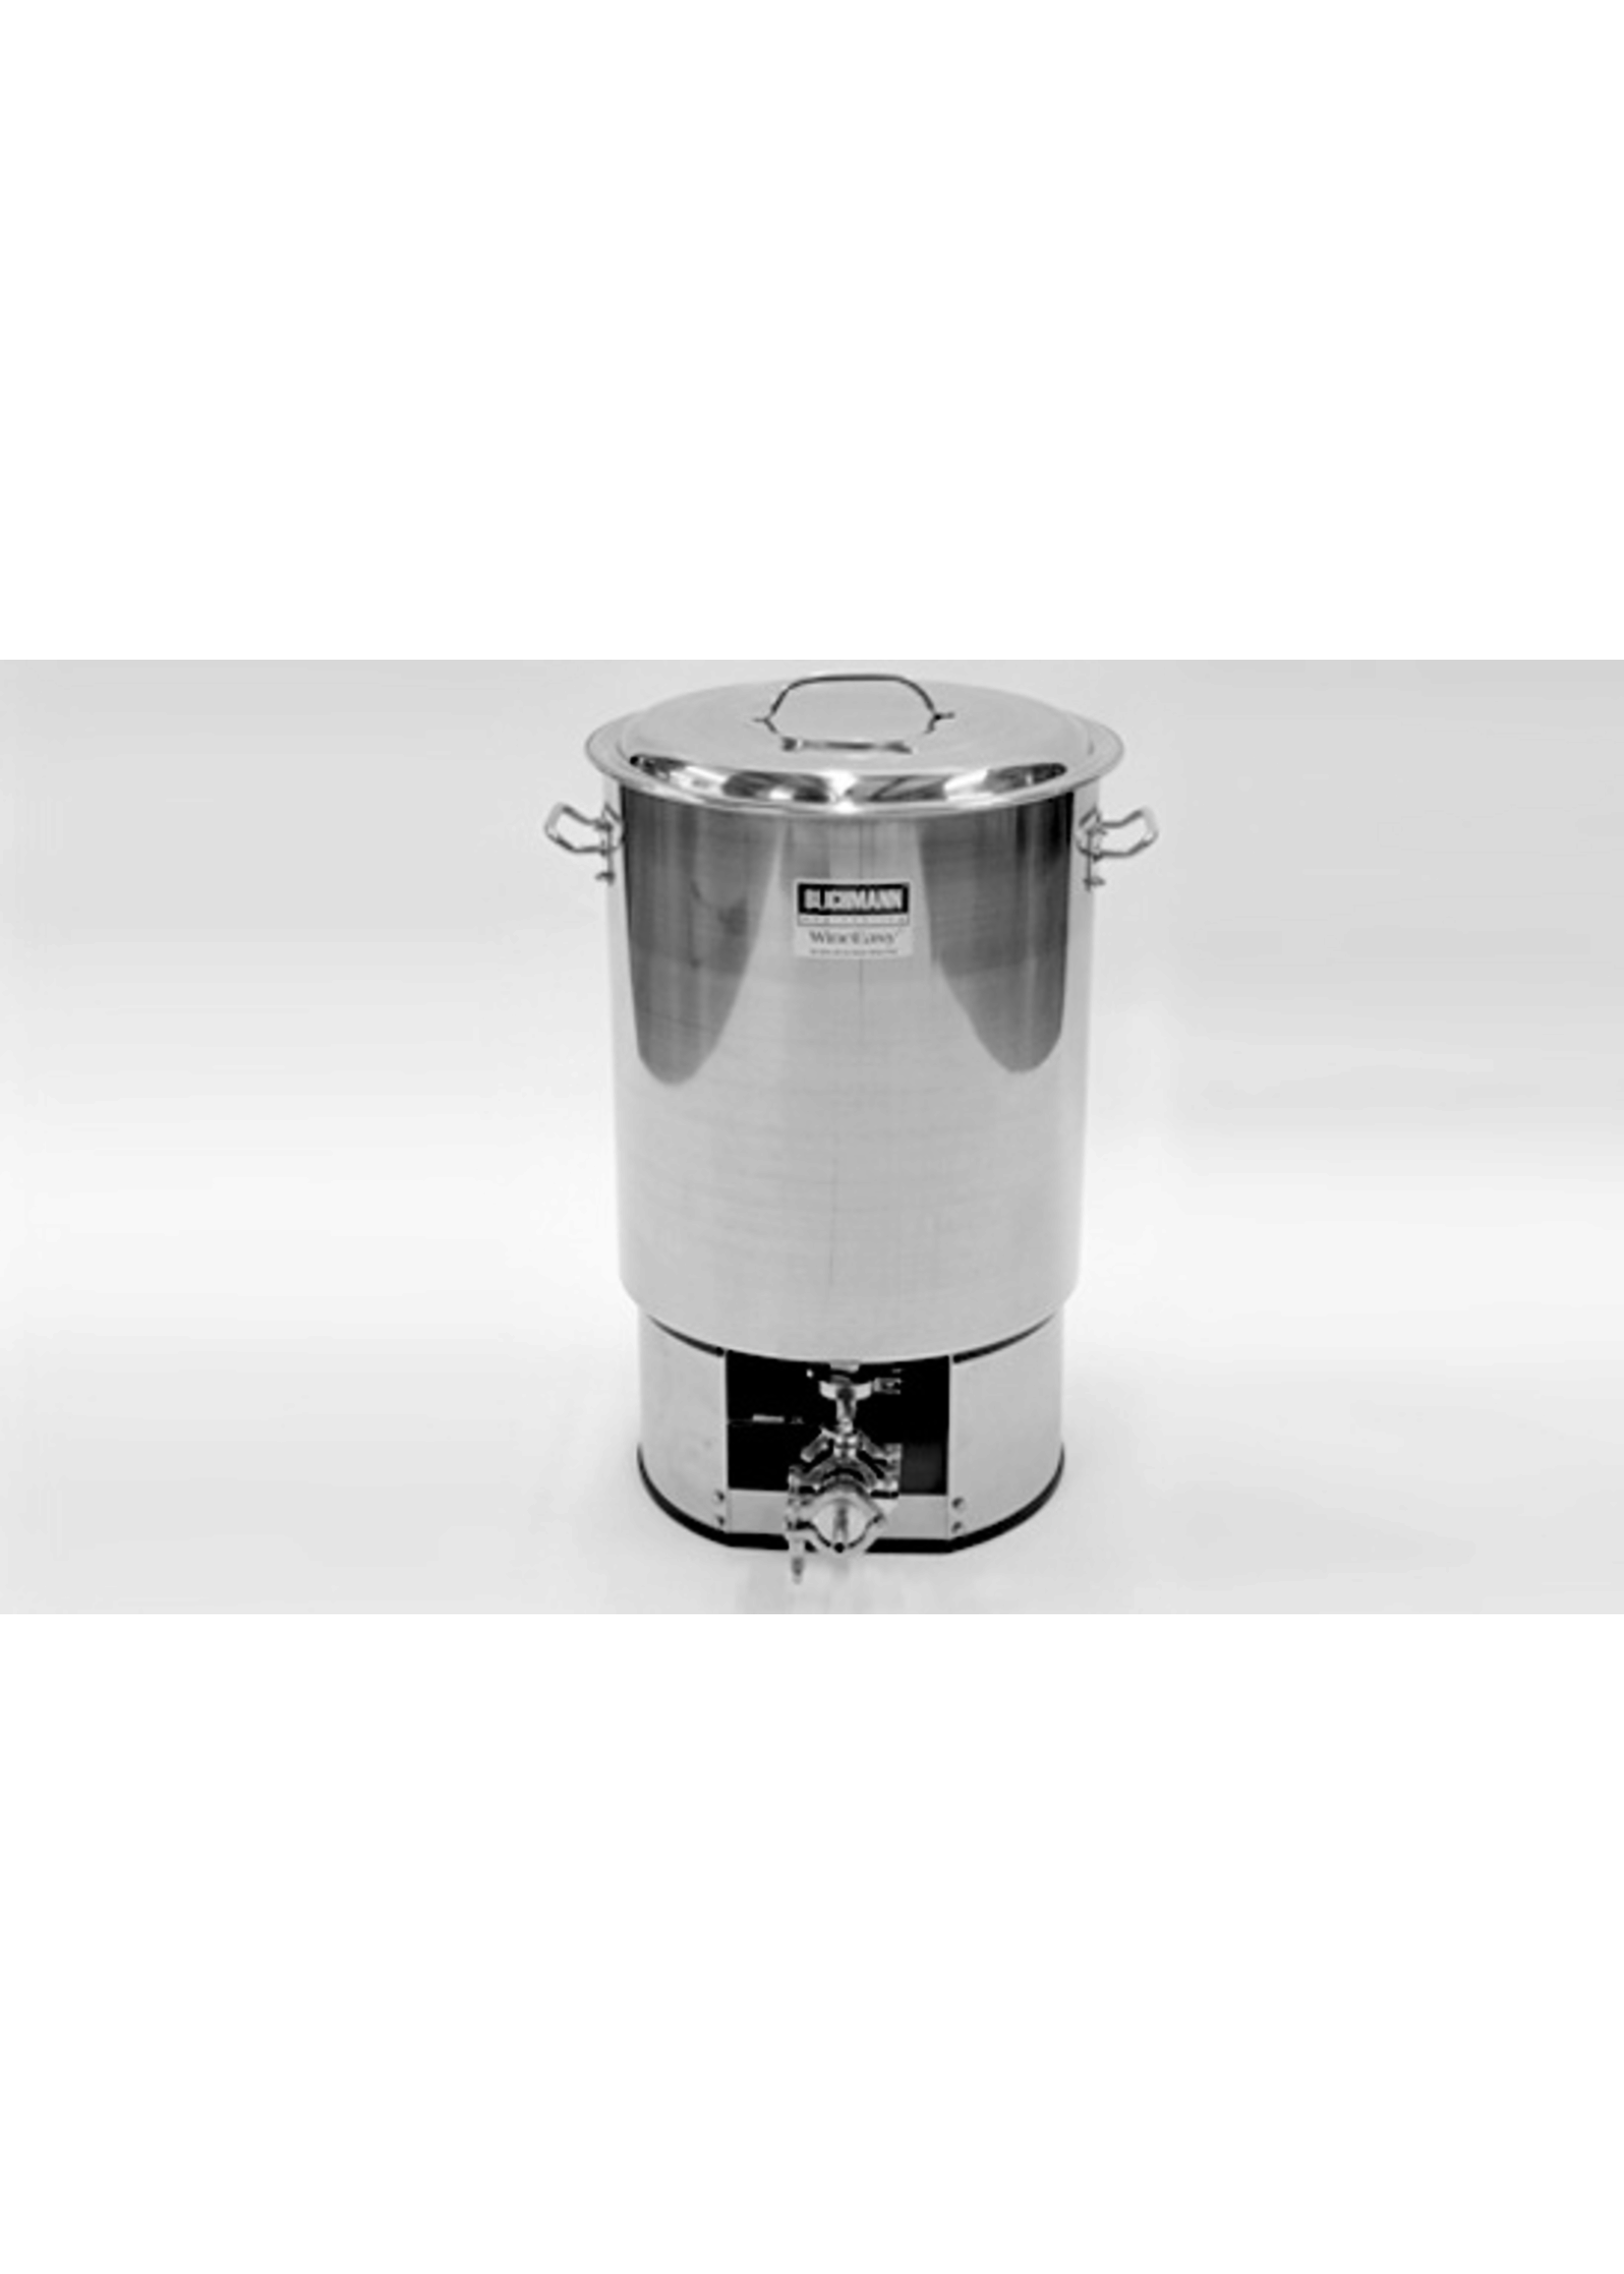 Blichmann Blichmann WineEasy - 55 Gallon Fermentor